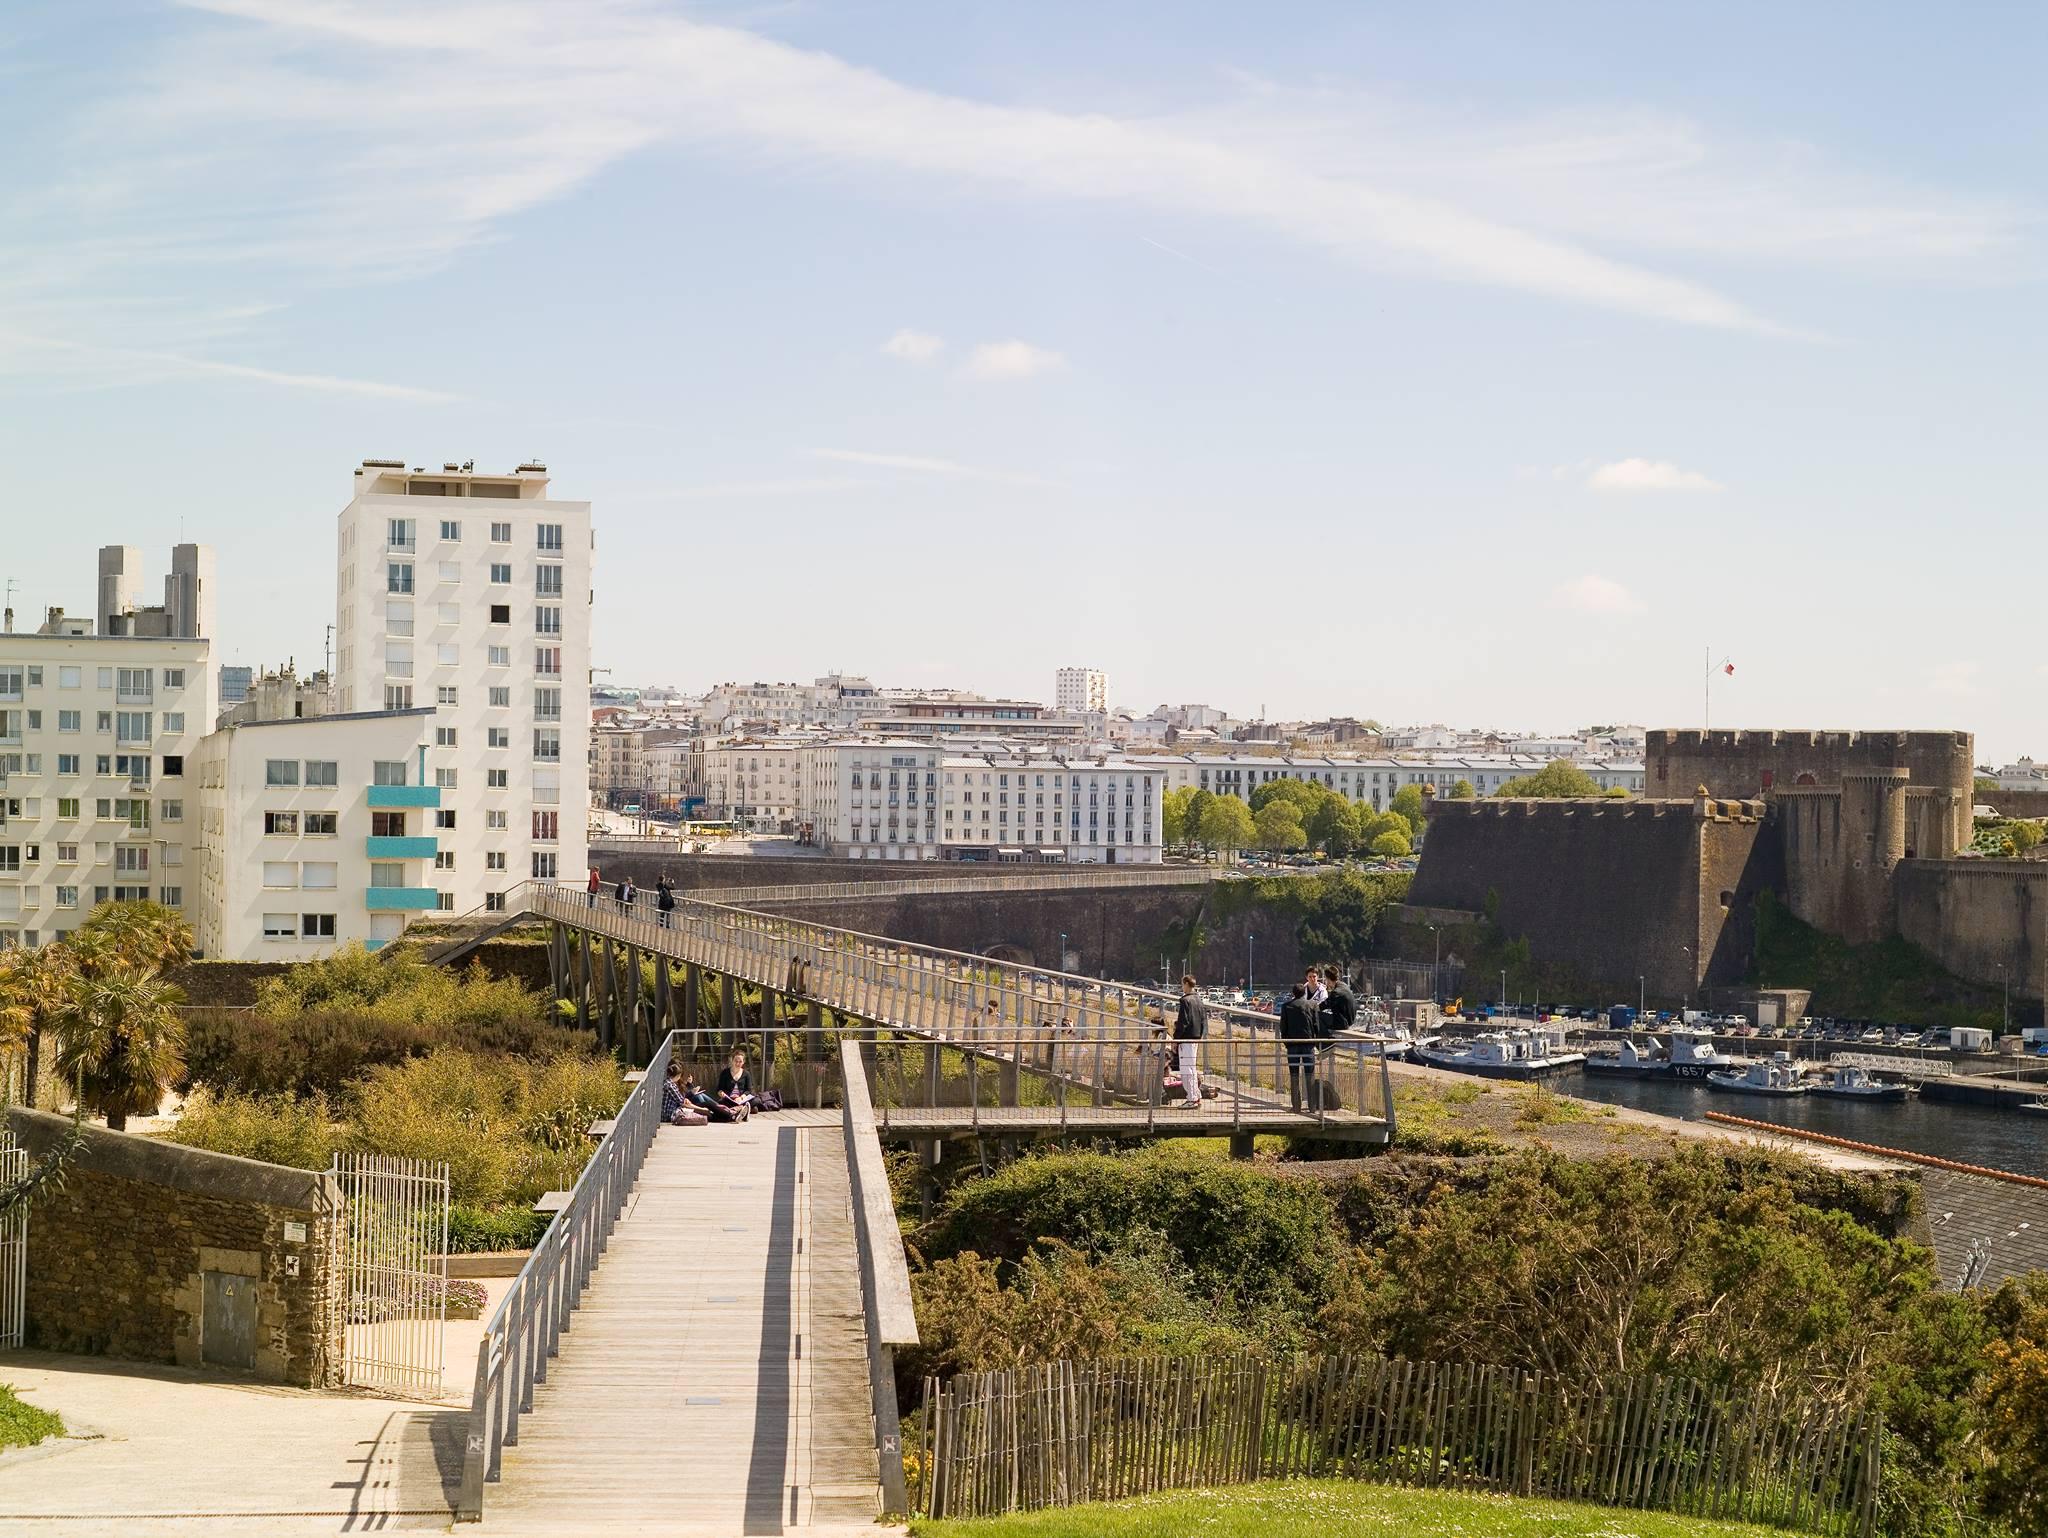 Université de Bretagne Occidentale – UBO Campus